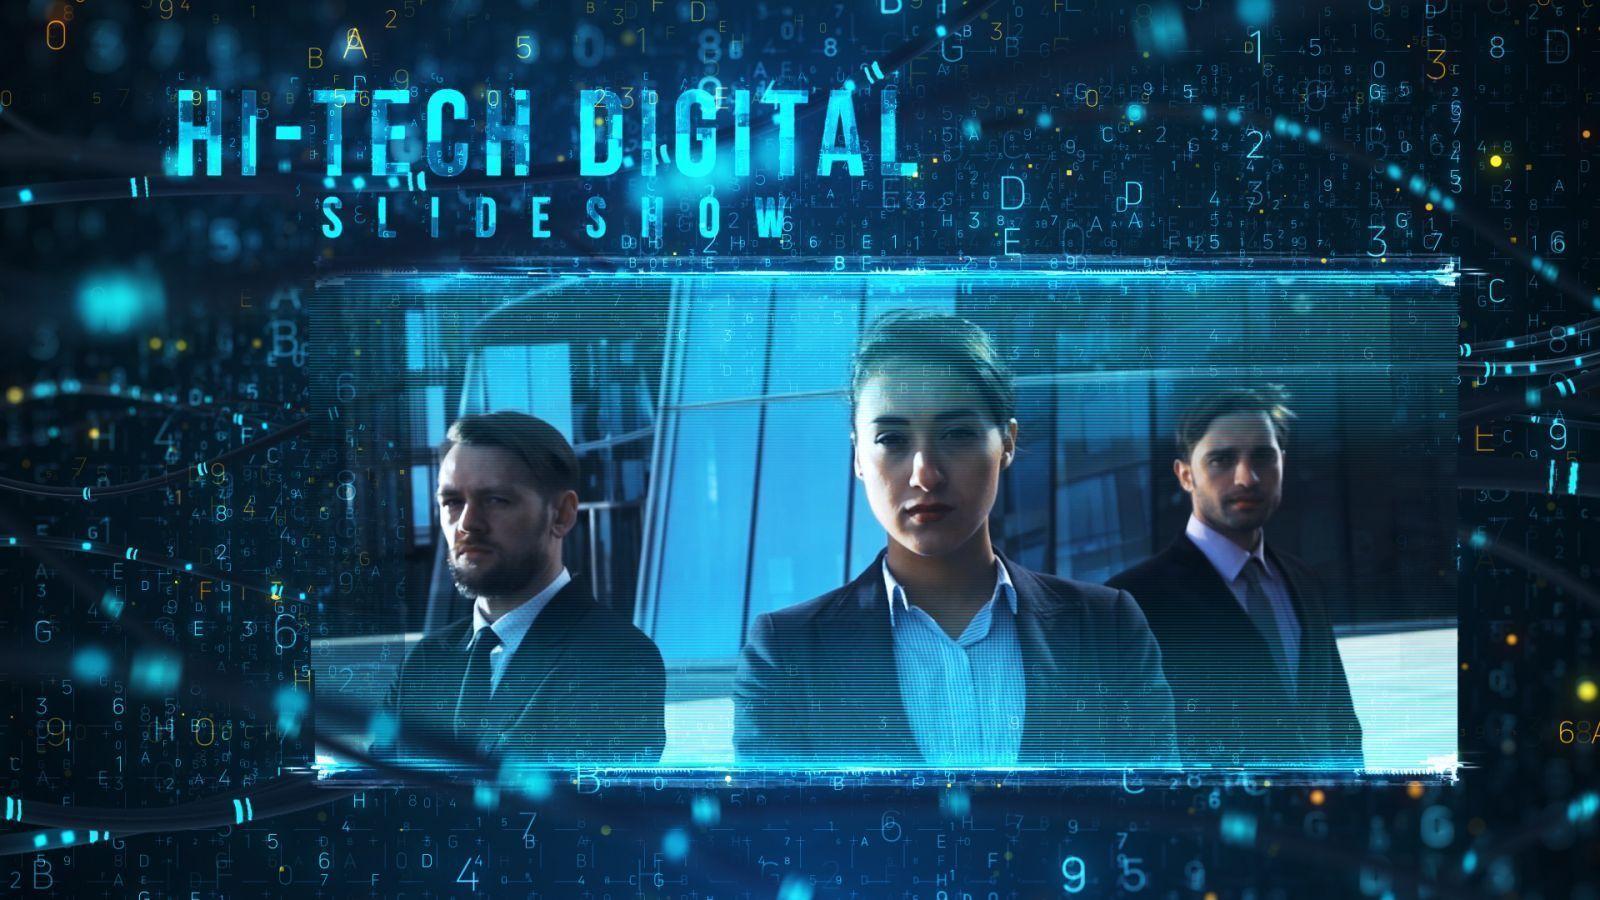 Hi-tech Digital Slideshow